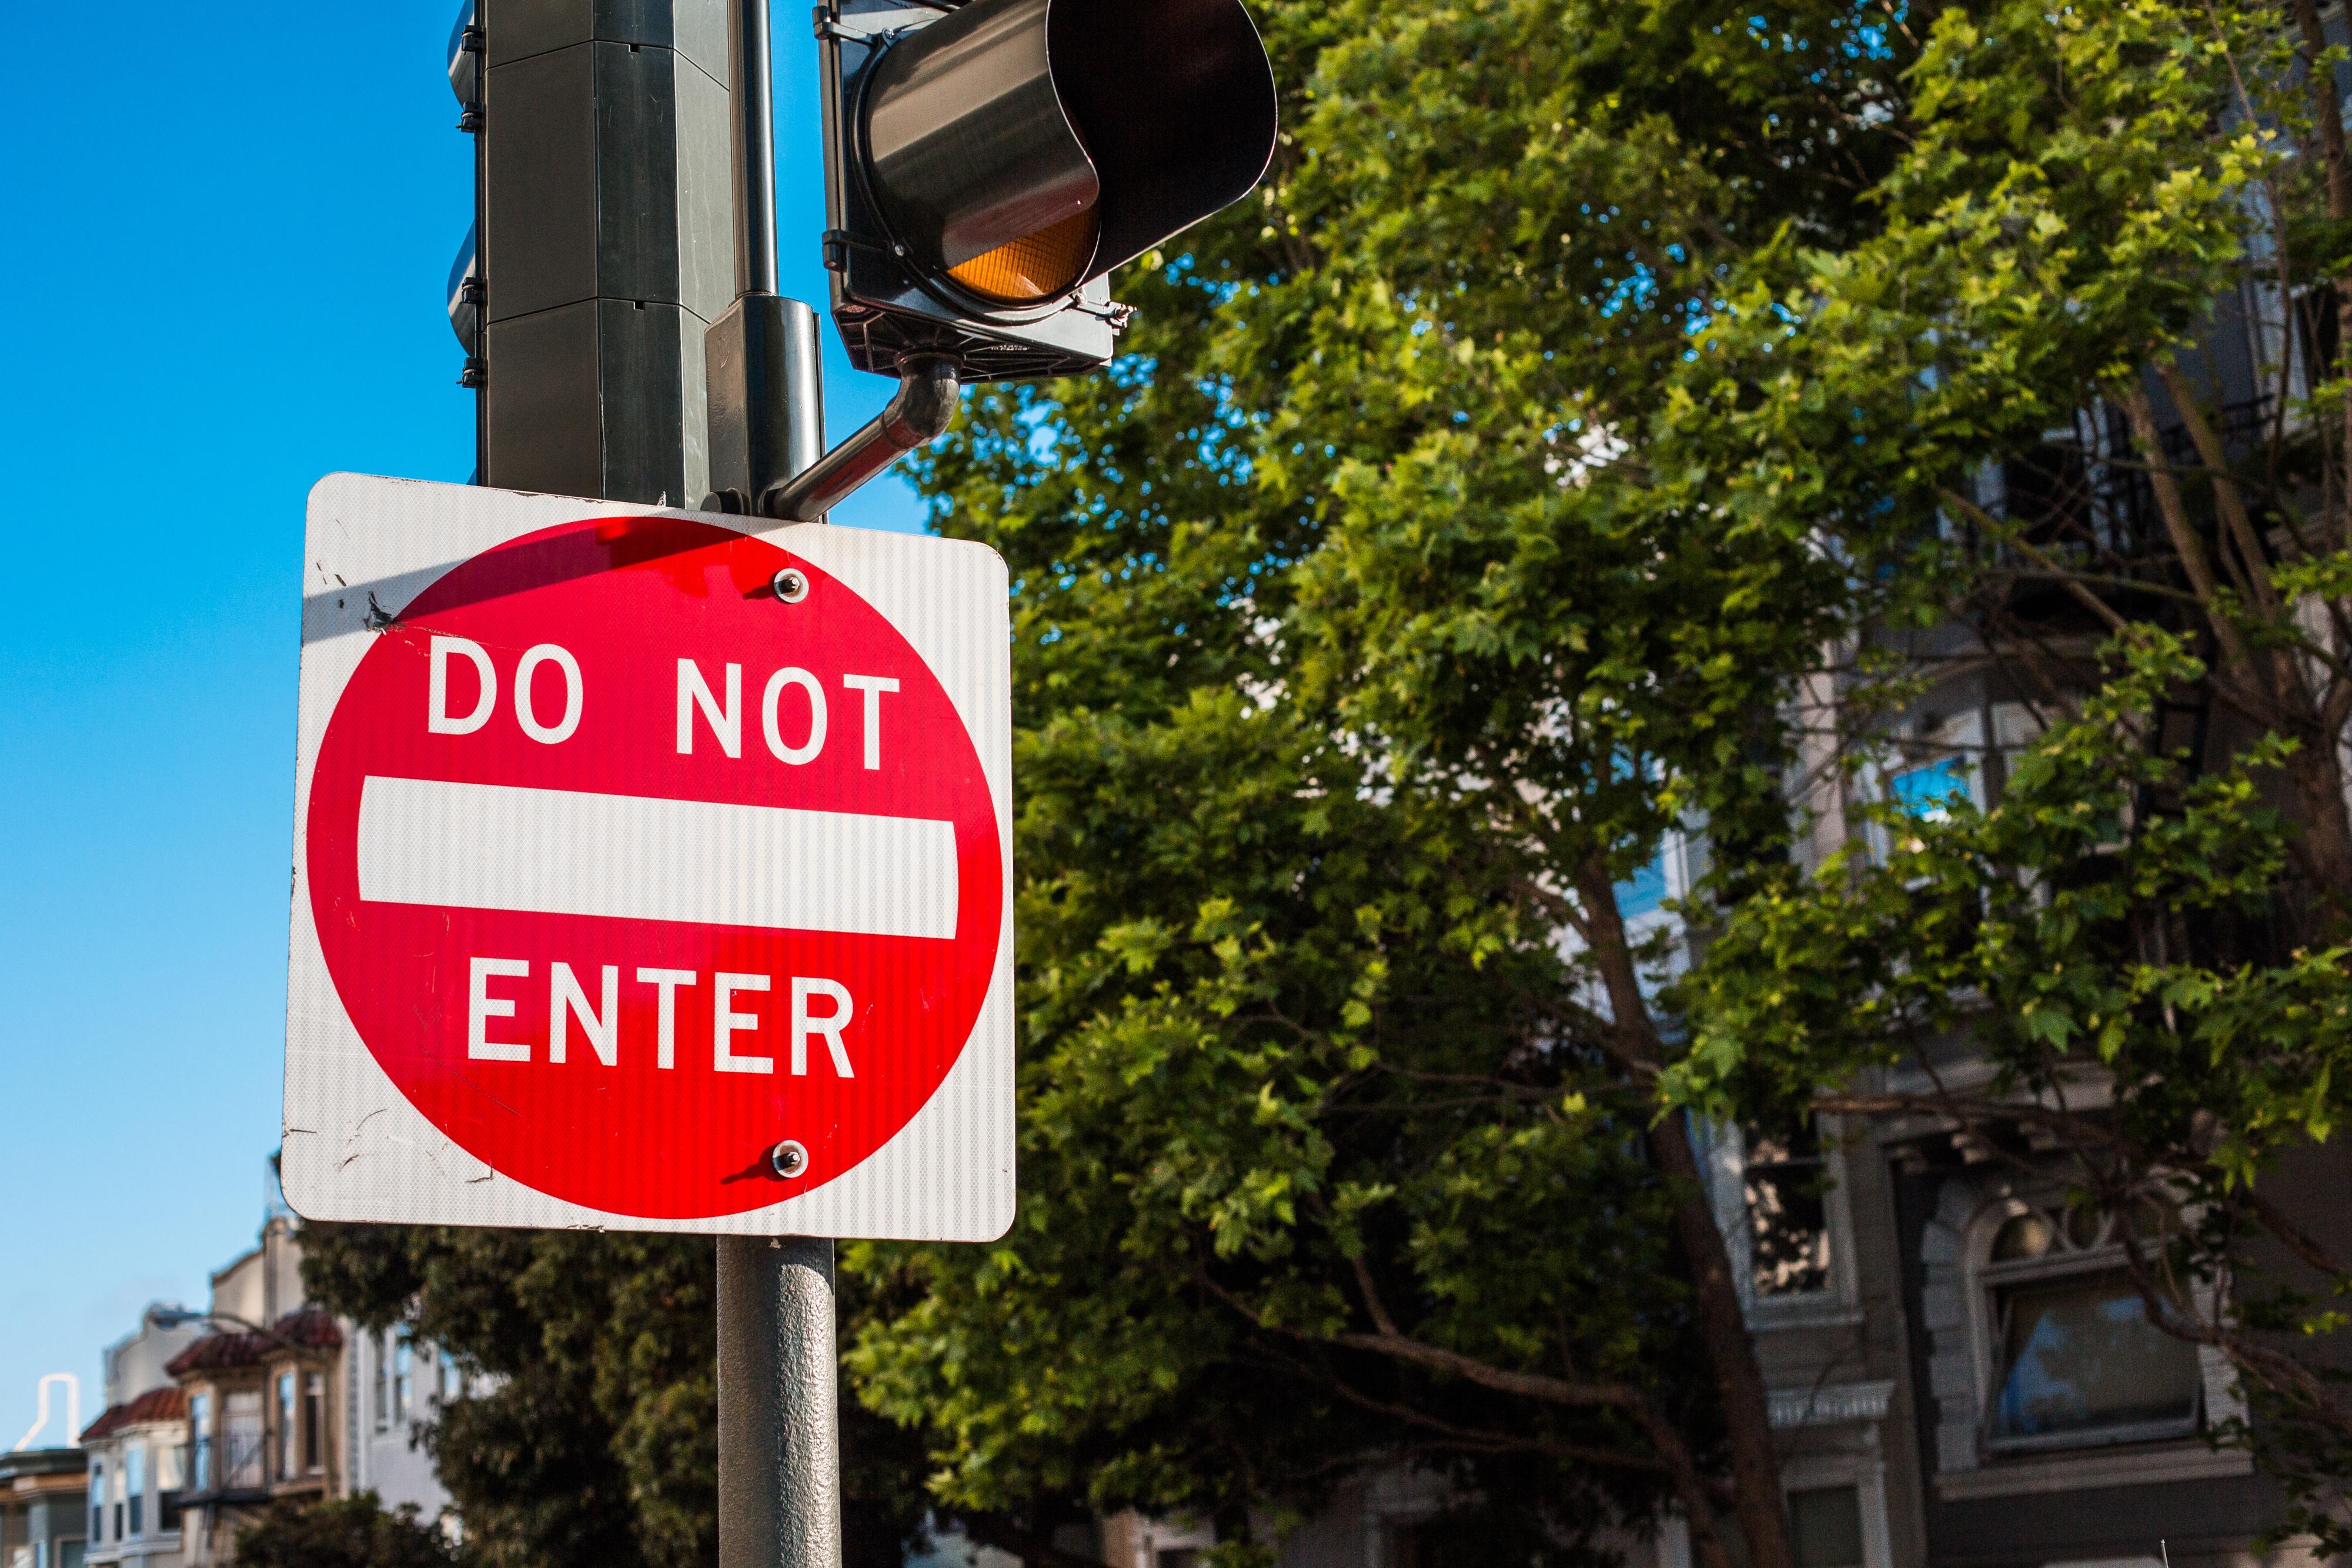 do-not-enter-traffic-control-sign-in-san-francisco-picjumbo-com.jpg